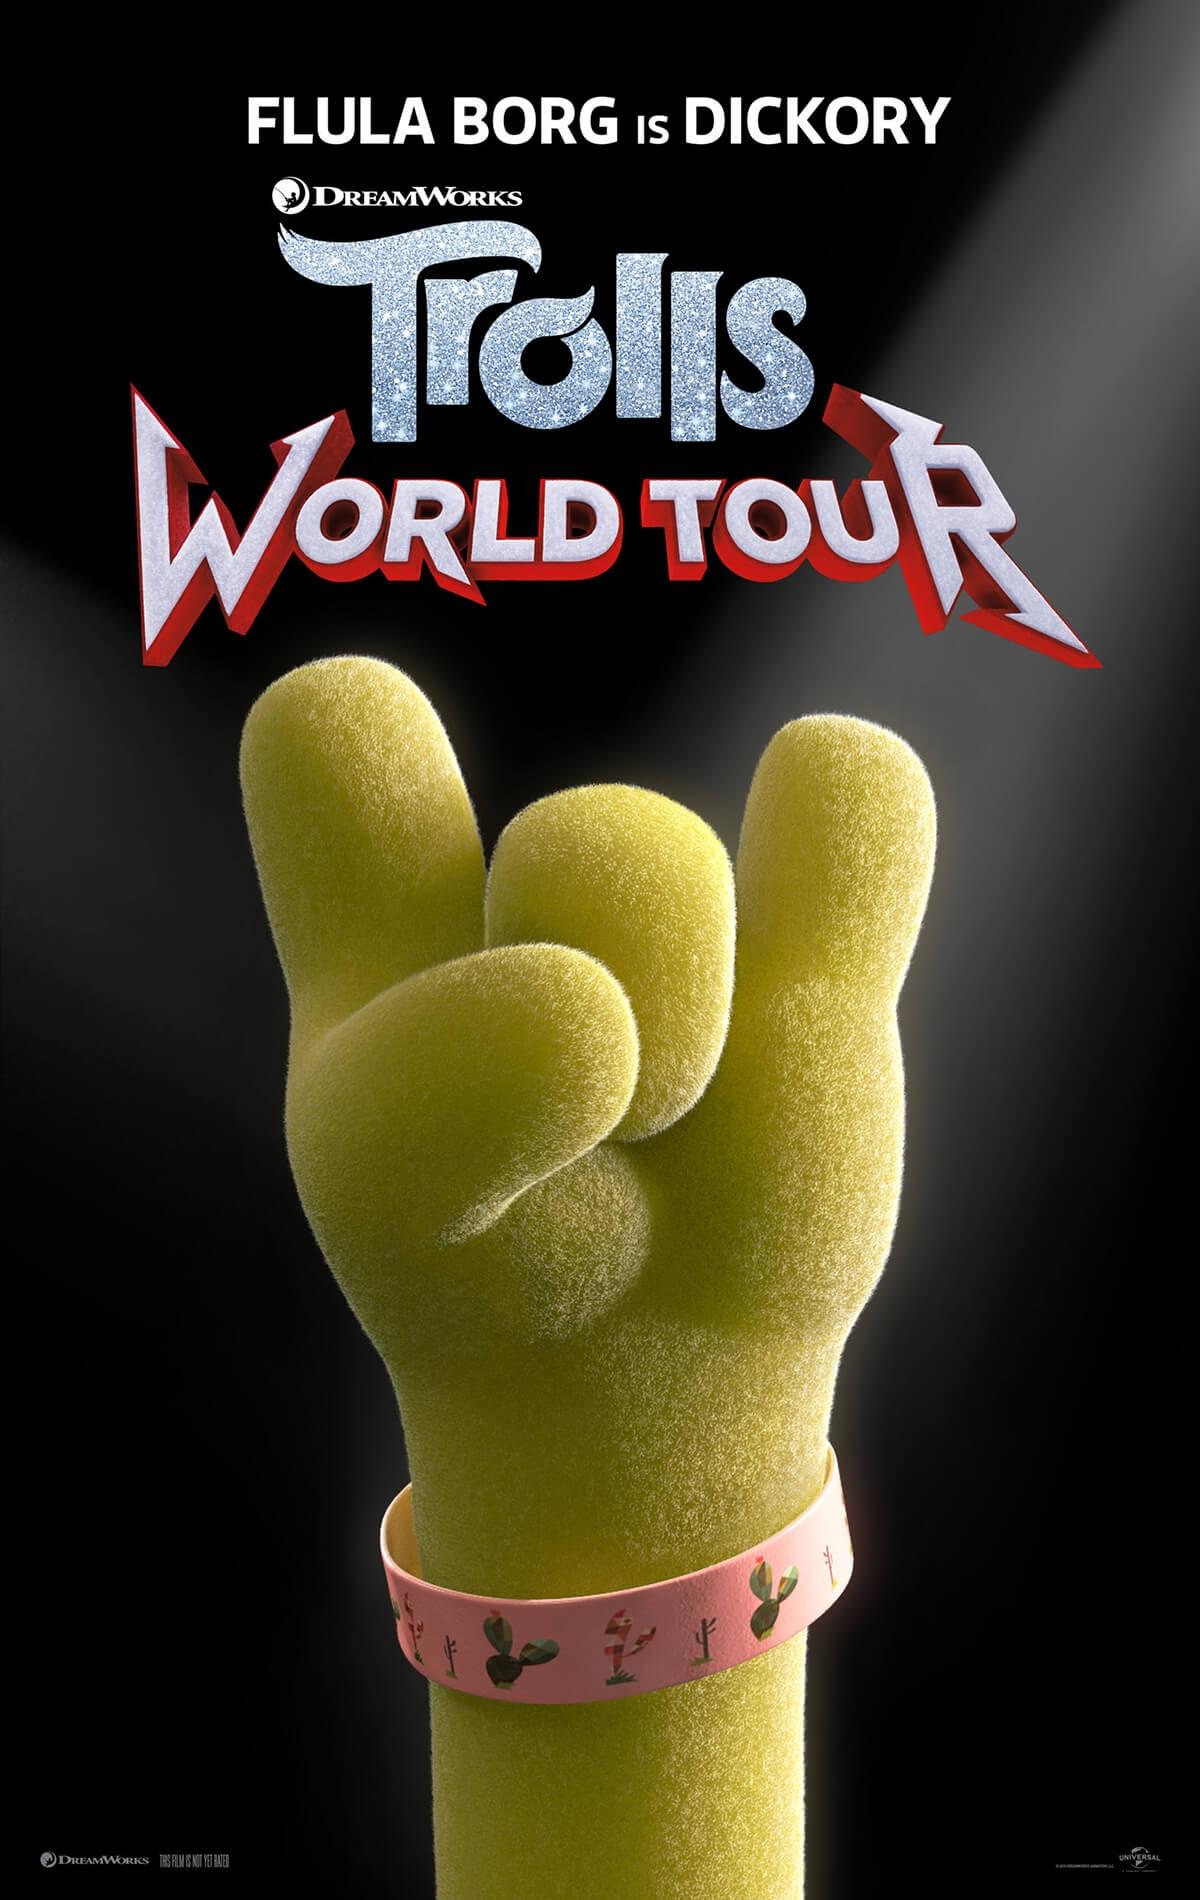 Trolls World Tour - Poster 7